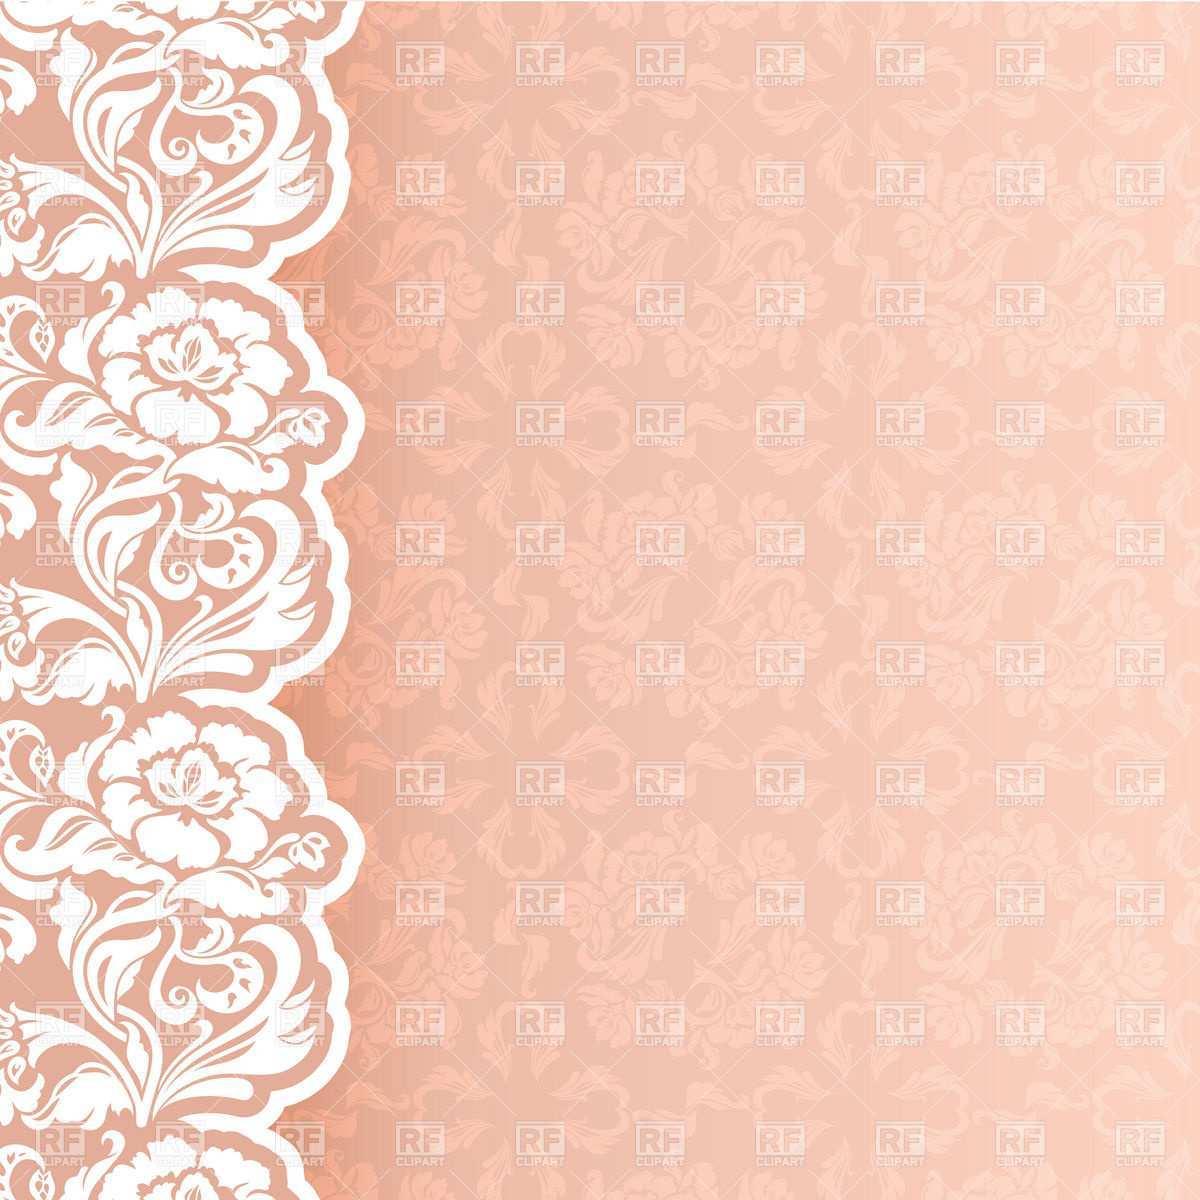 60 Standard Wedding Invitation Template Background Maker with Wedding Invitation Template Background